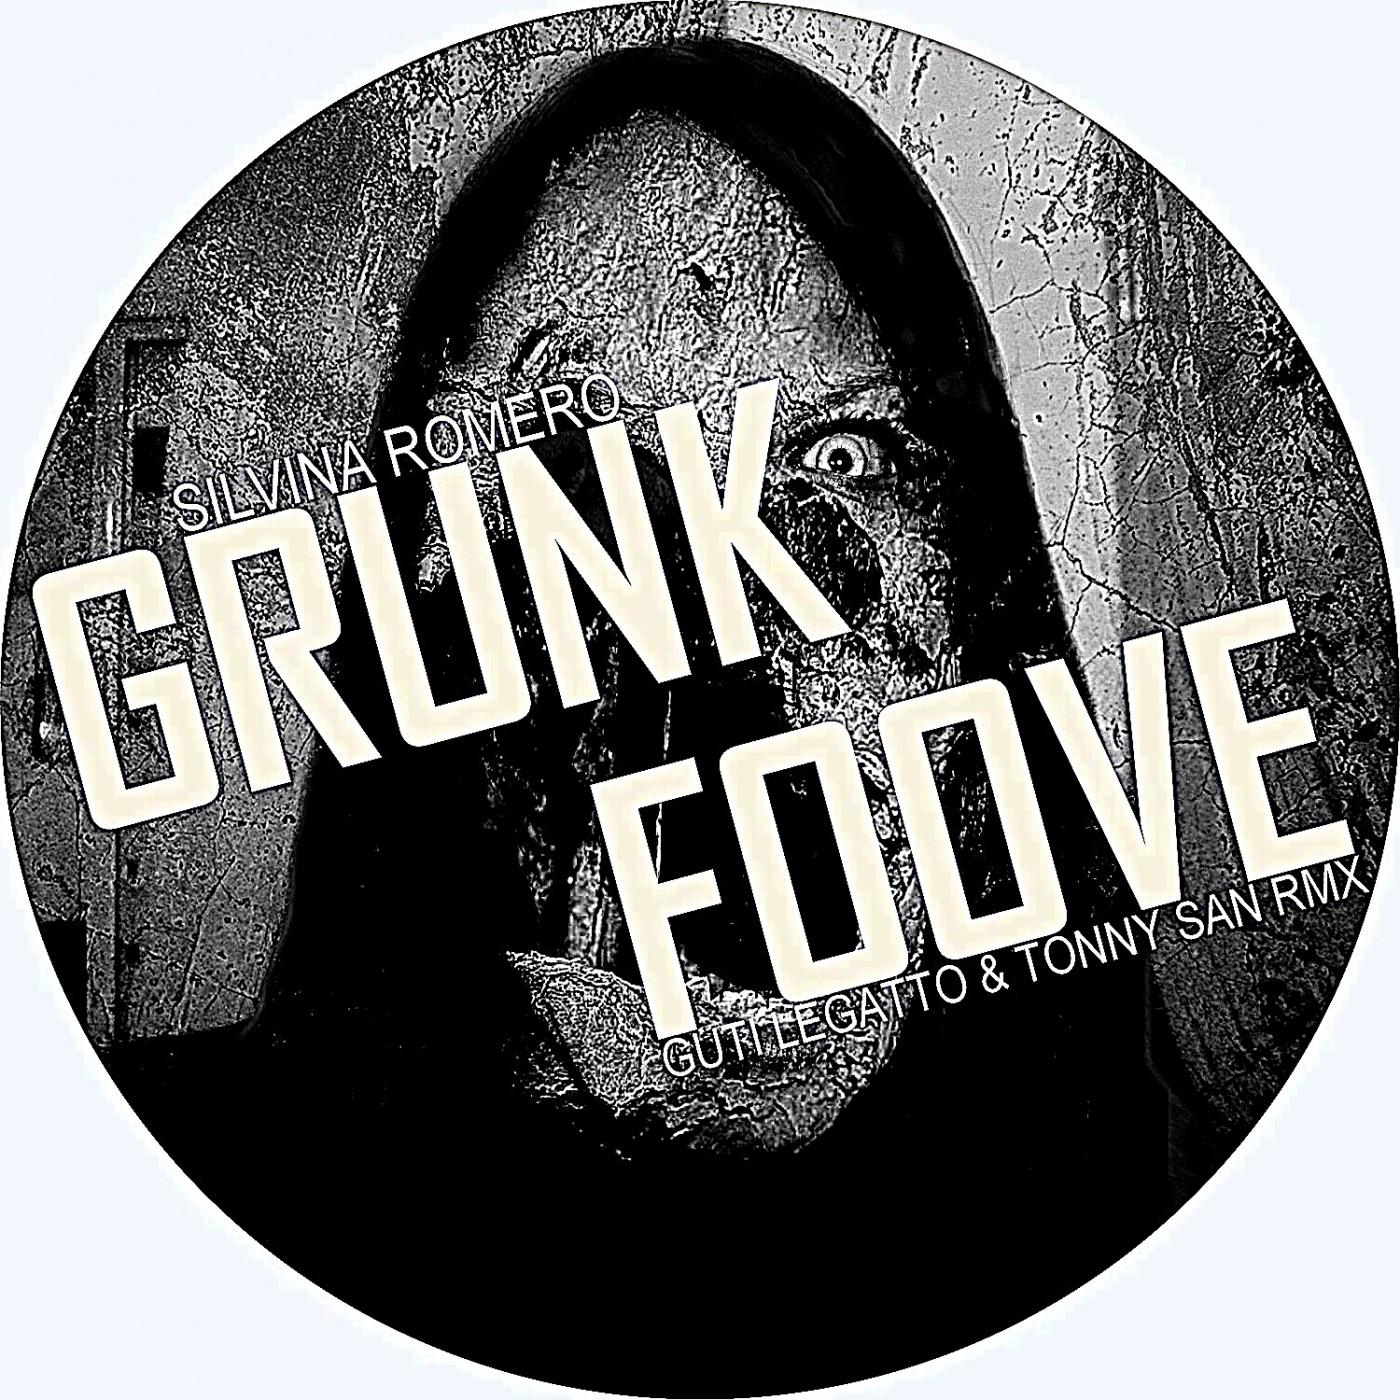 Grunk Foove